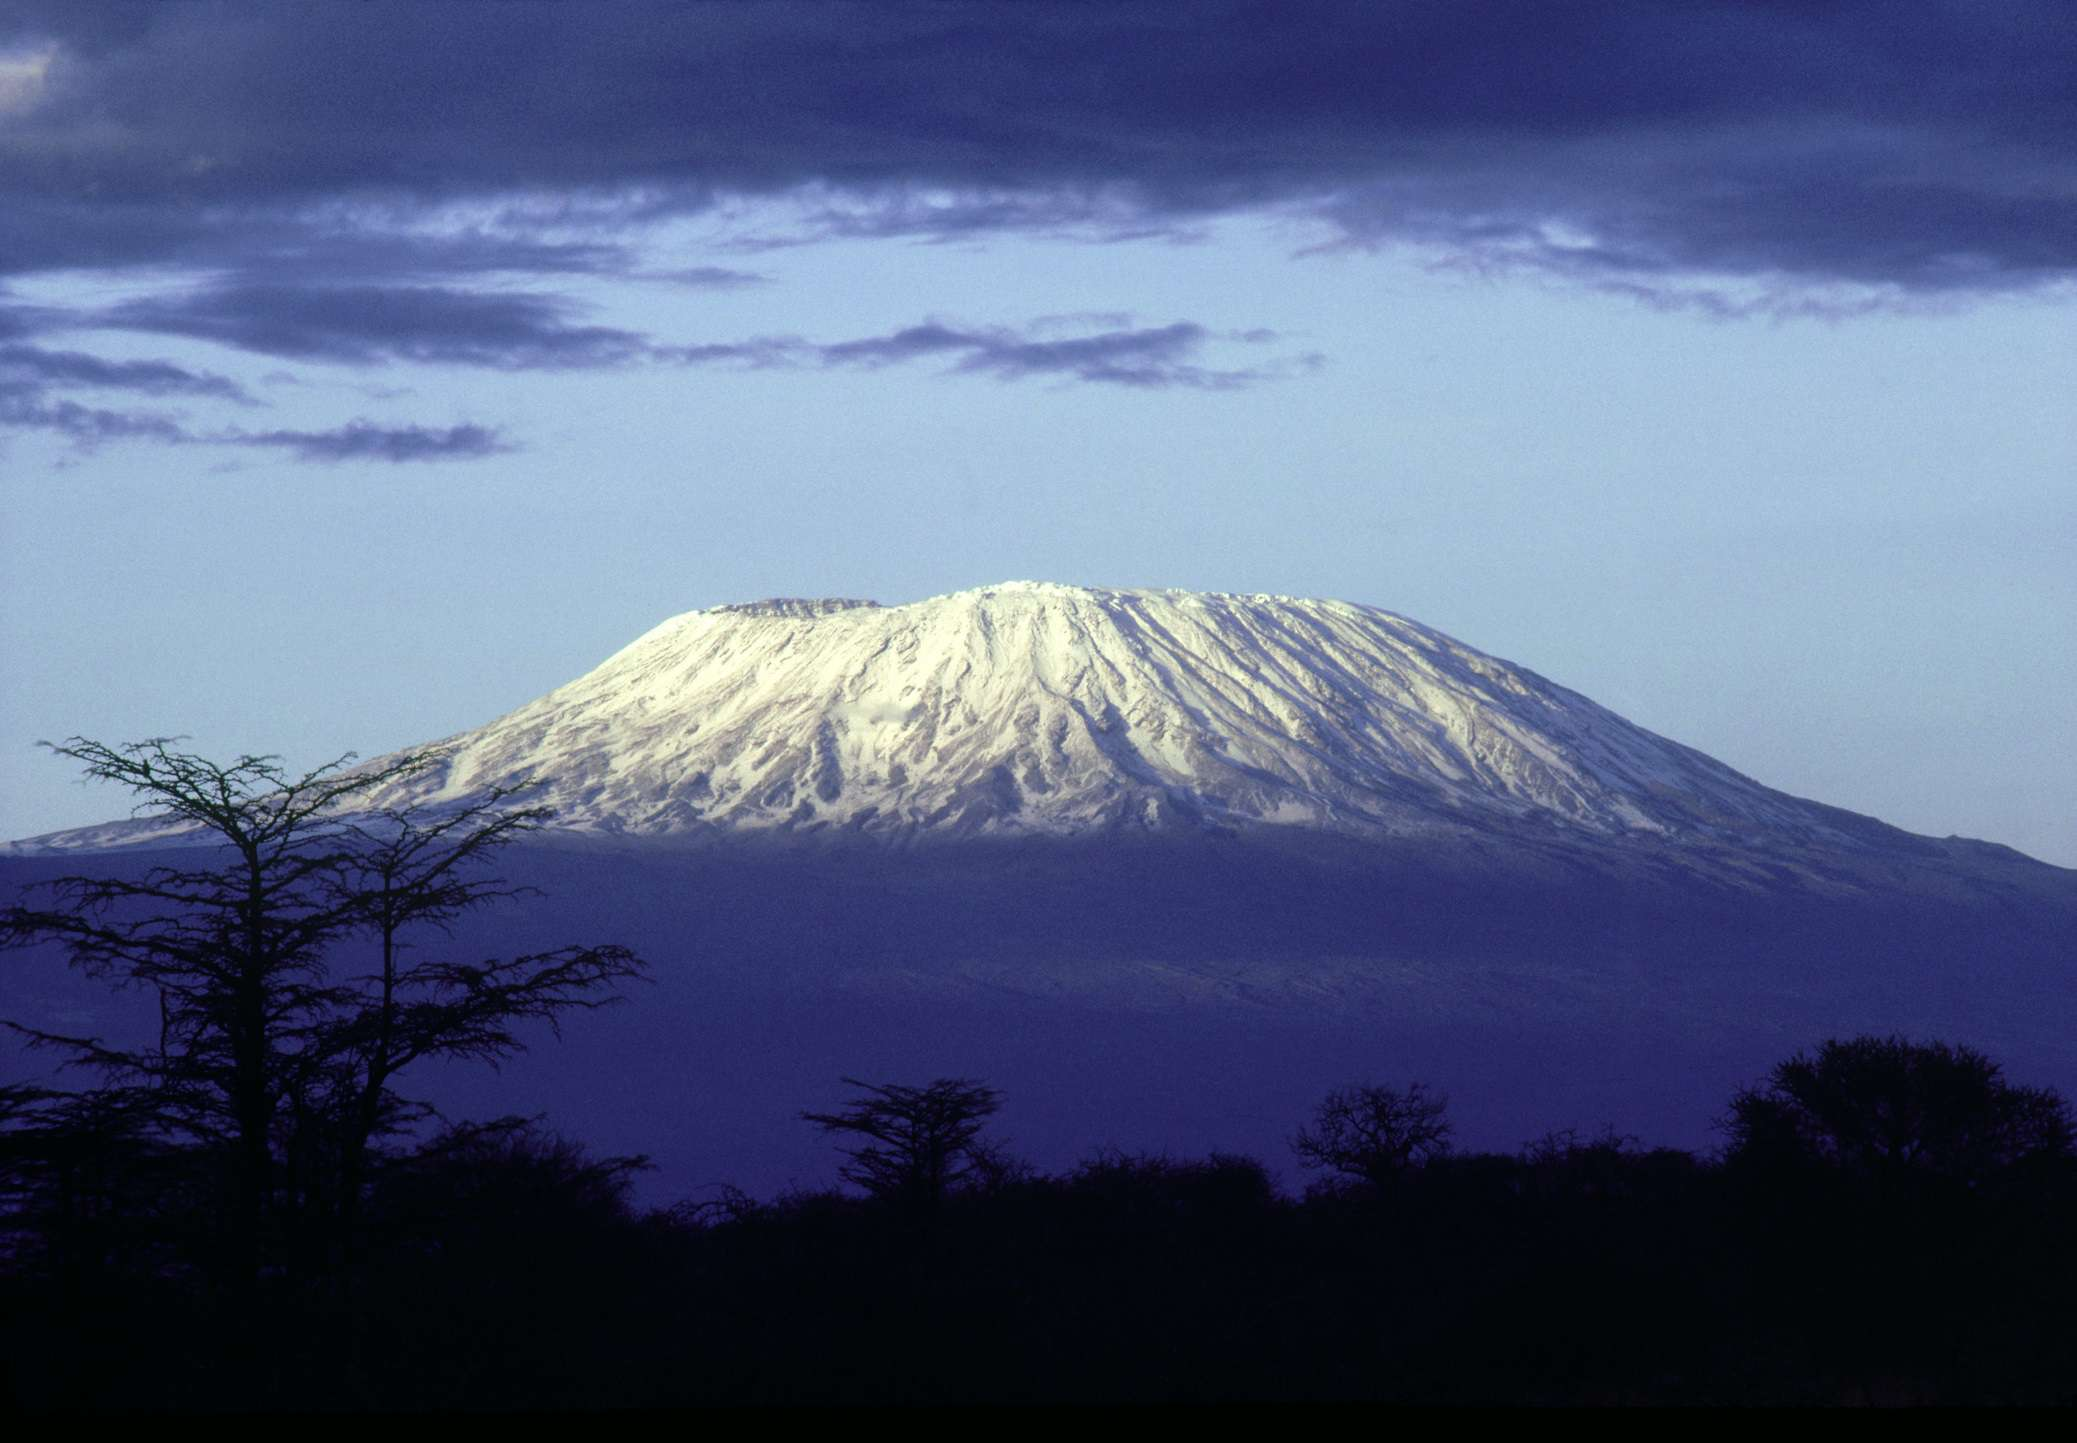 mt. kilimanjaro, at dawn, tanzania